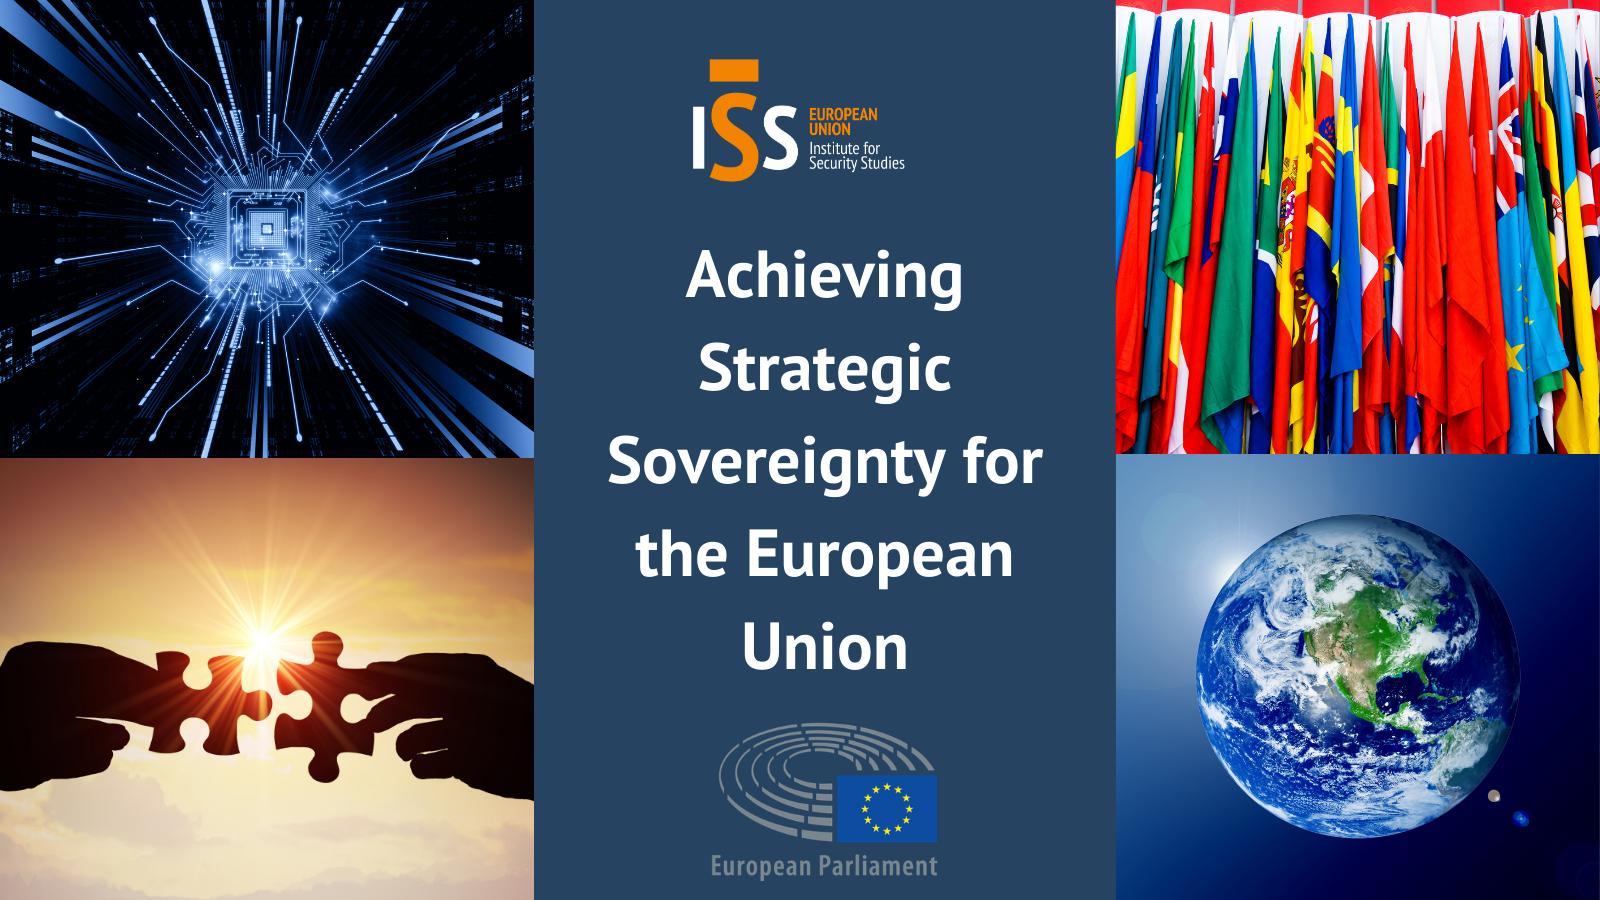 Achieving strategic sovereignty for the European Union